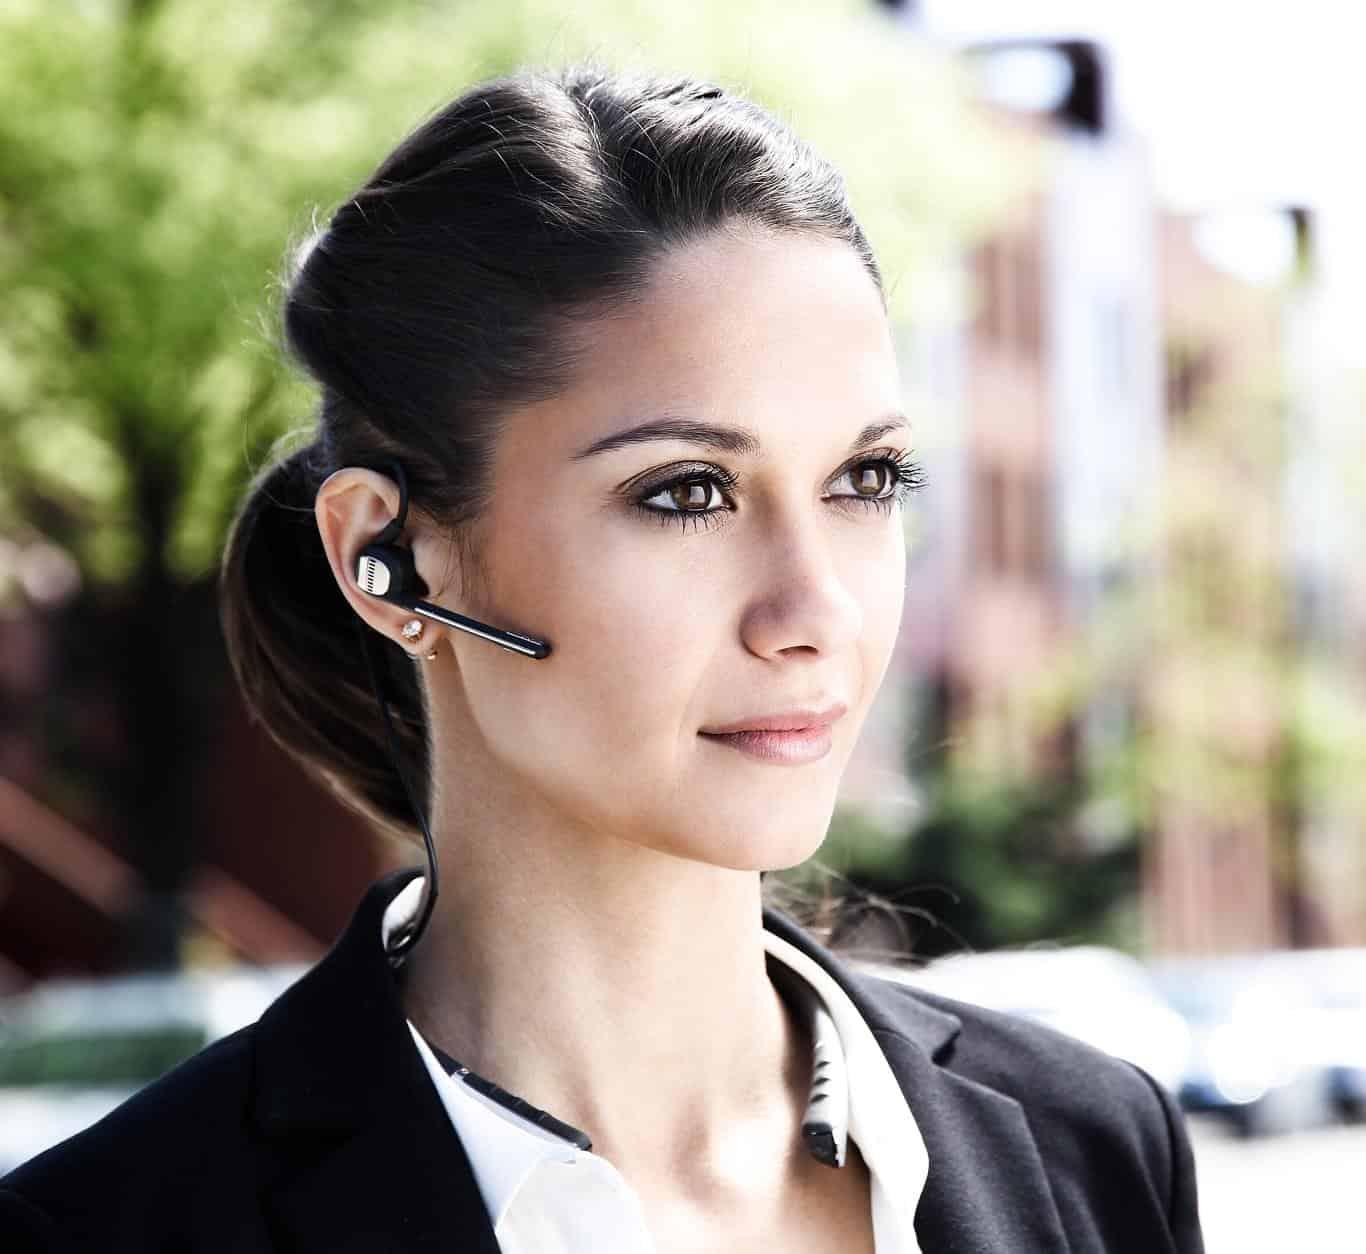 onvocal-ov-intelligent-headphones-2